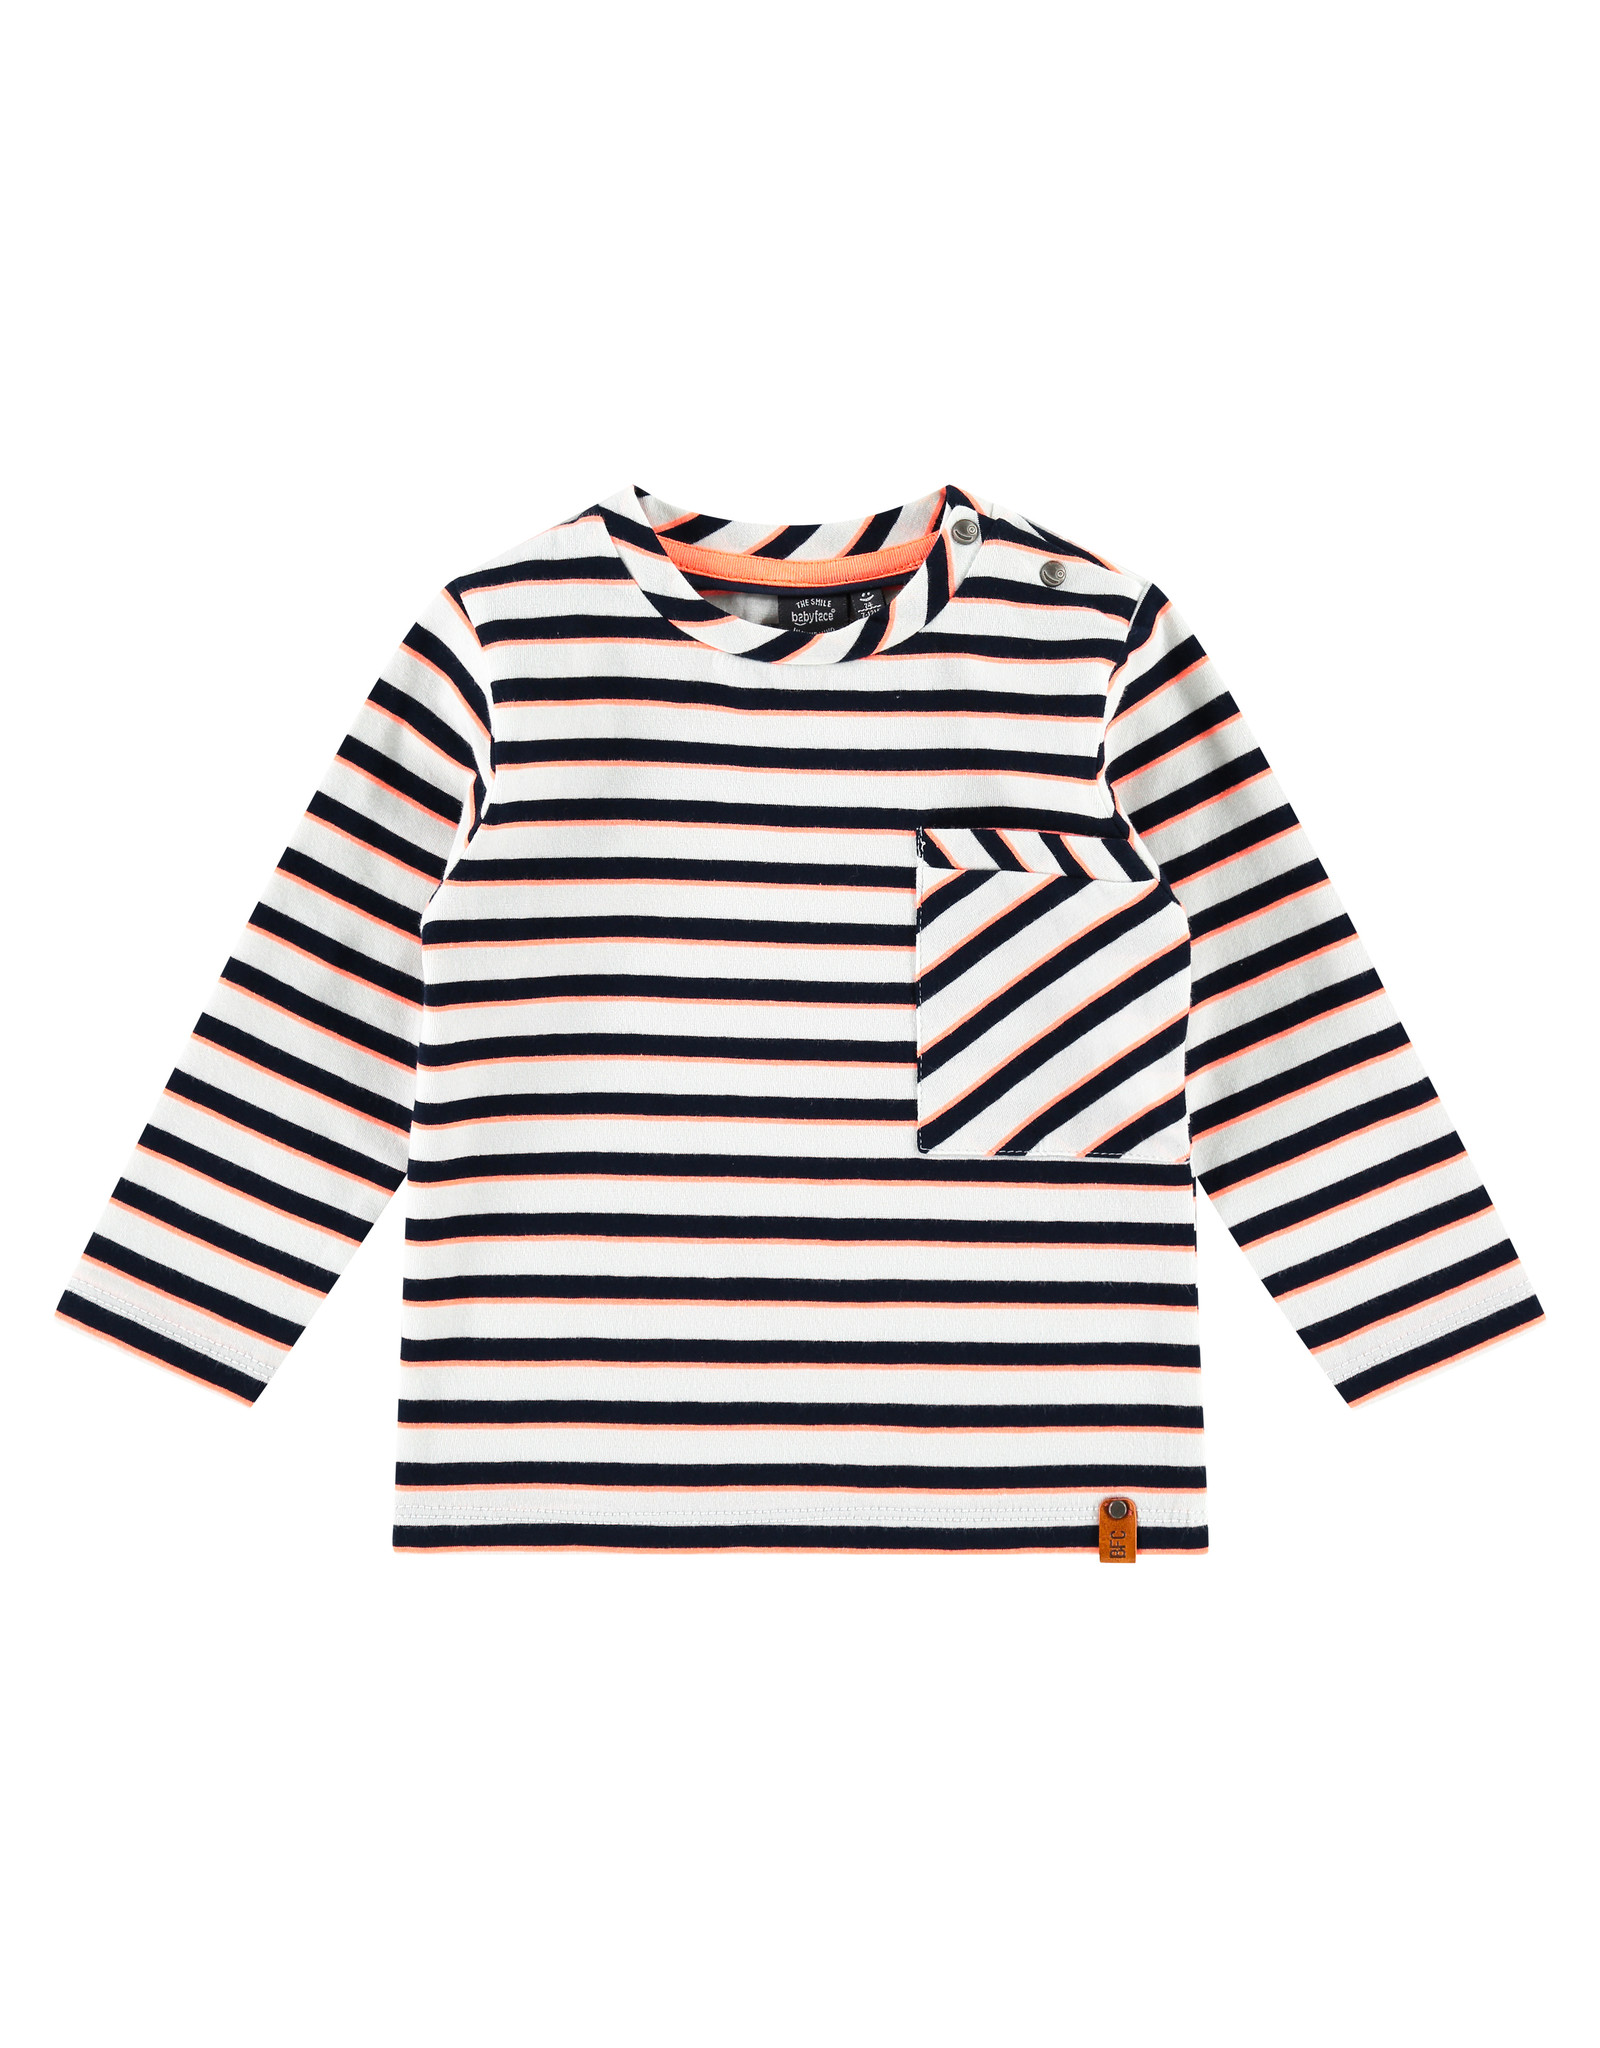 Babyface boys t-shirt long sleeve, white, BBE21107627